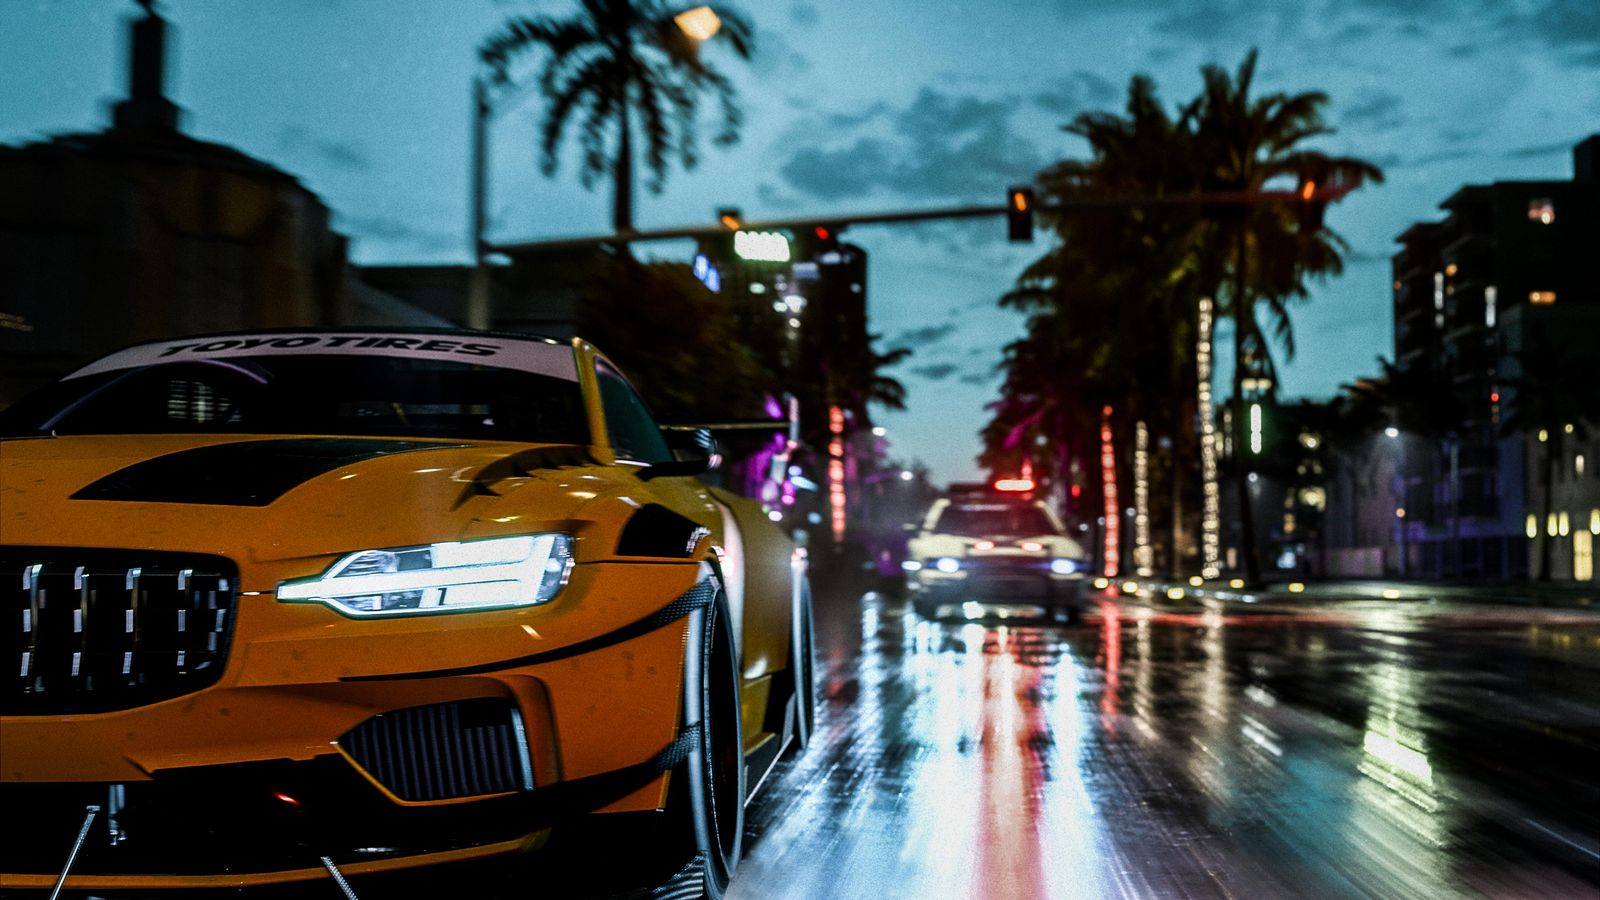 EINMALIGE VERWENDUNG Gamescom Highlights 2019/ Need for Speed Head/ Electronic Arts